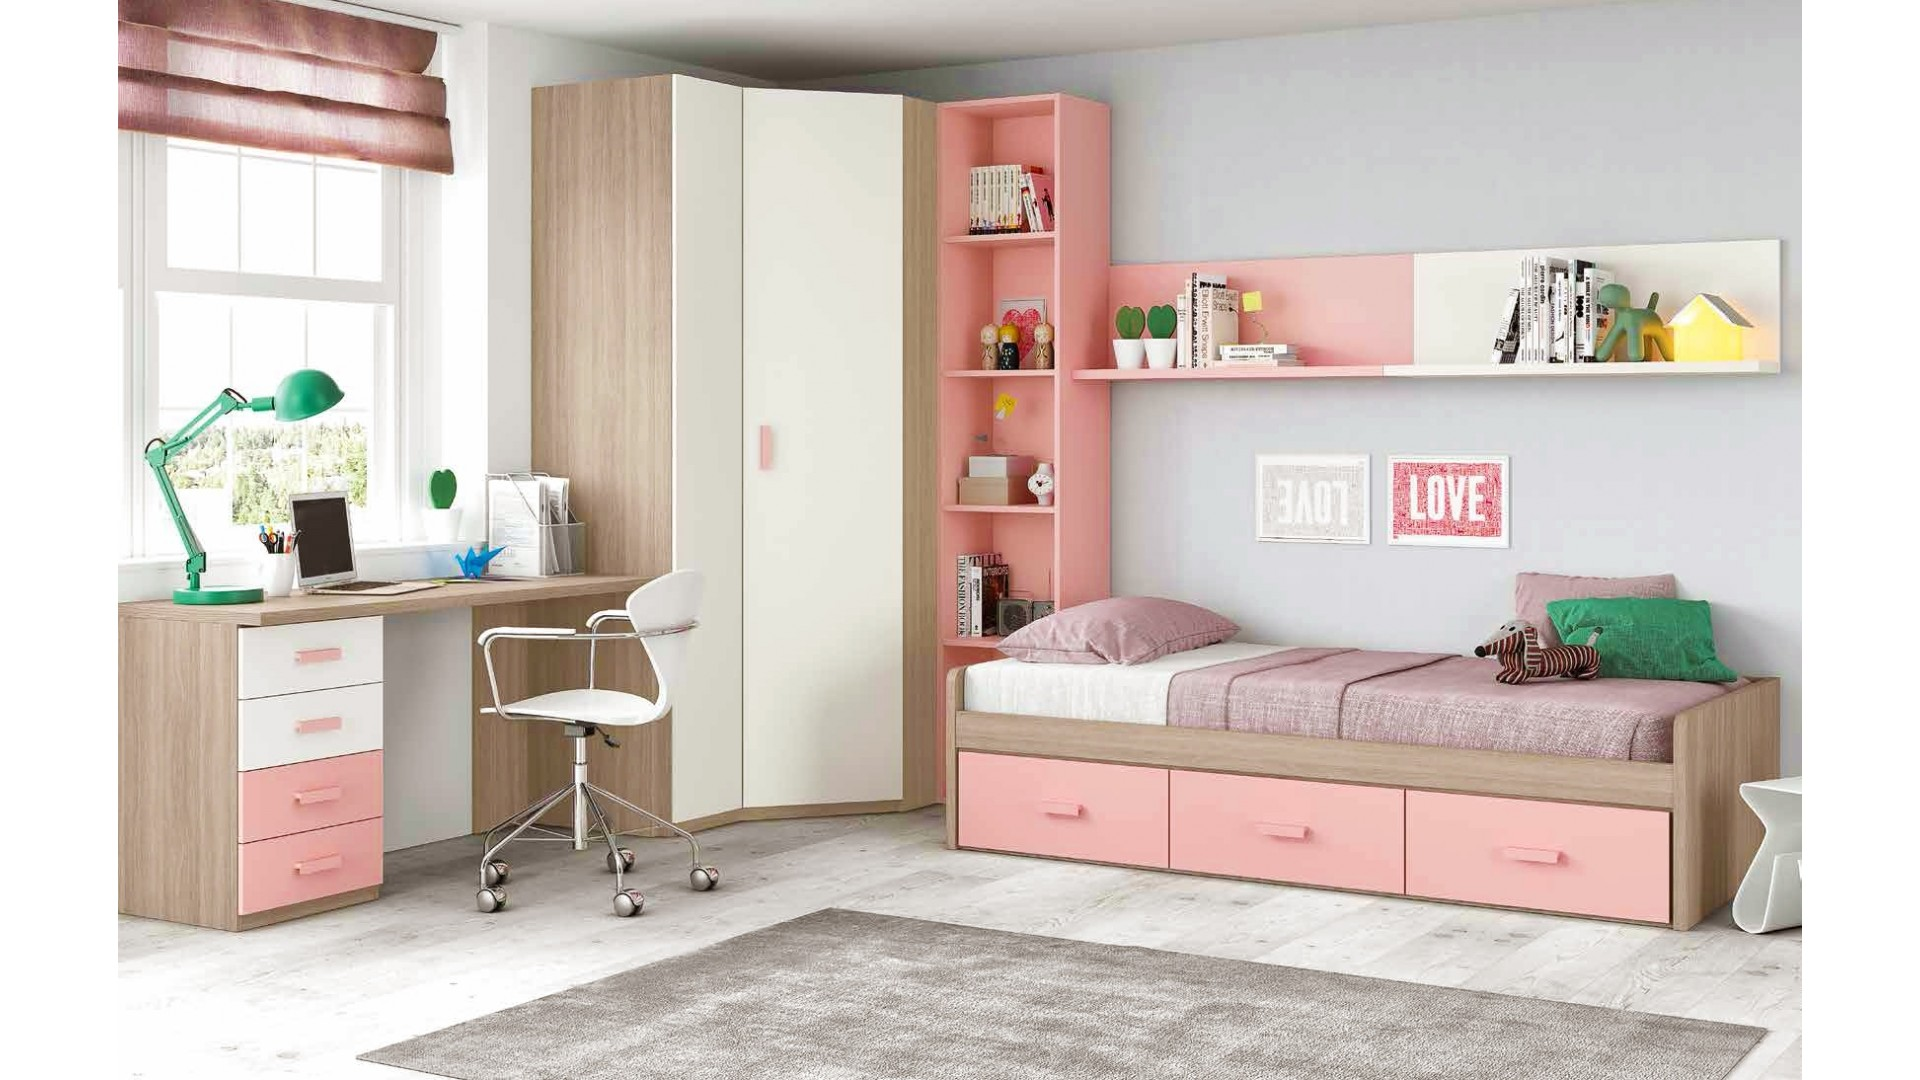 Chambre ado fille composition L110 avec lit 3 coffres - GLICERIO